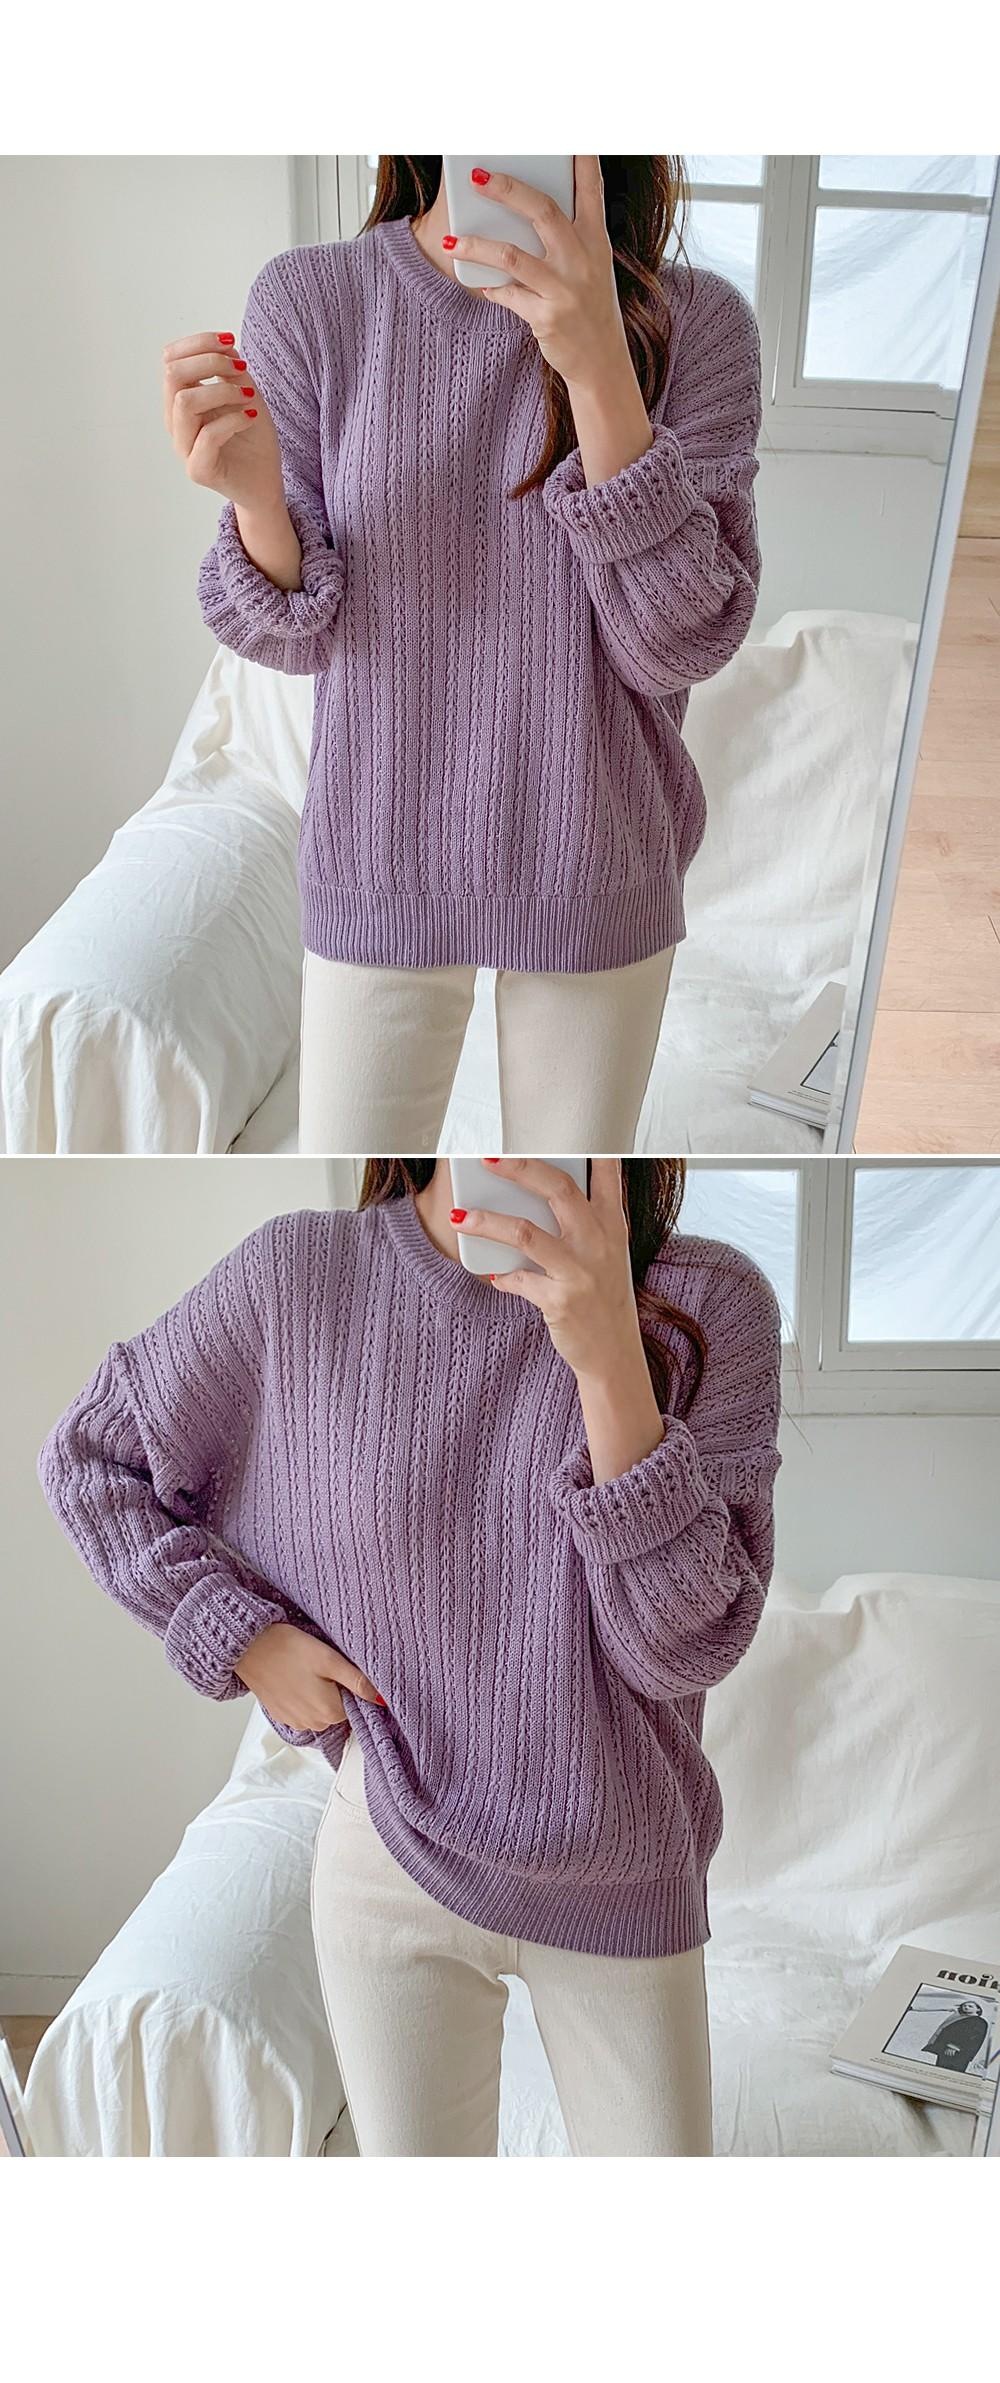 Jenny Knitting